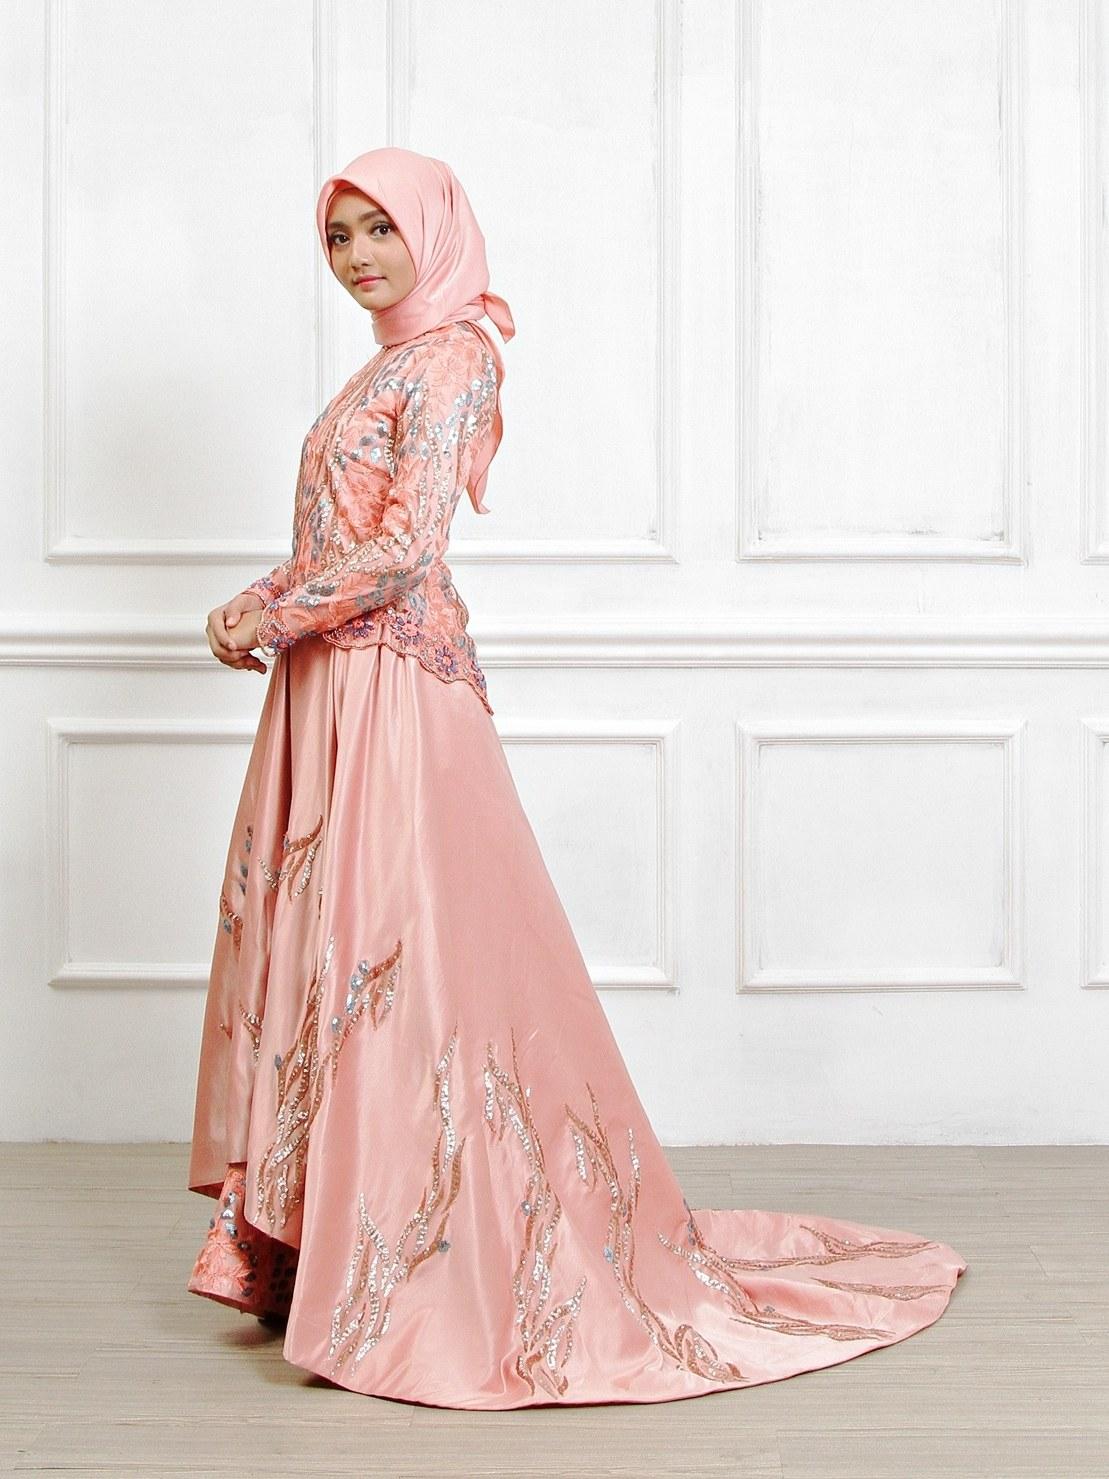 Bentuk Harga Sewa Gaun Pengantin Muslimah Ffdn Sewa Perdana Baju Pengantin Muslimah Jogja Gaun Pengantin